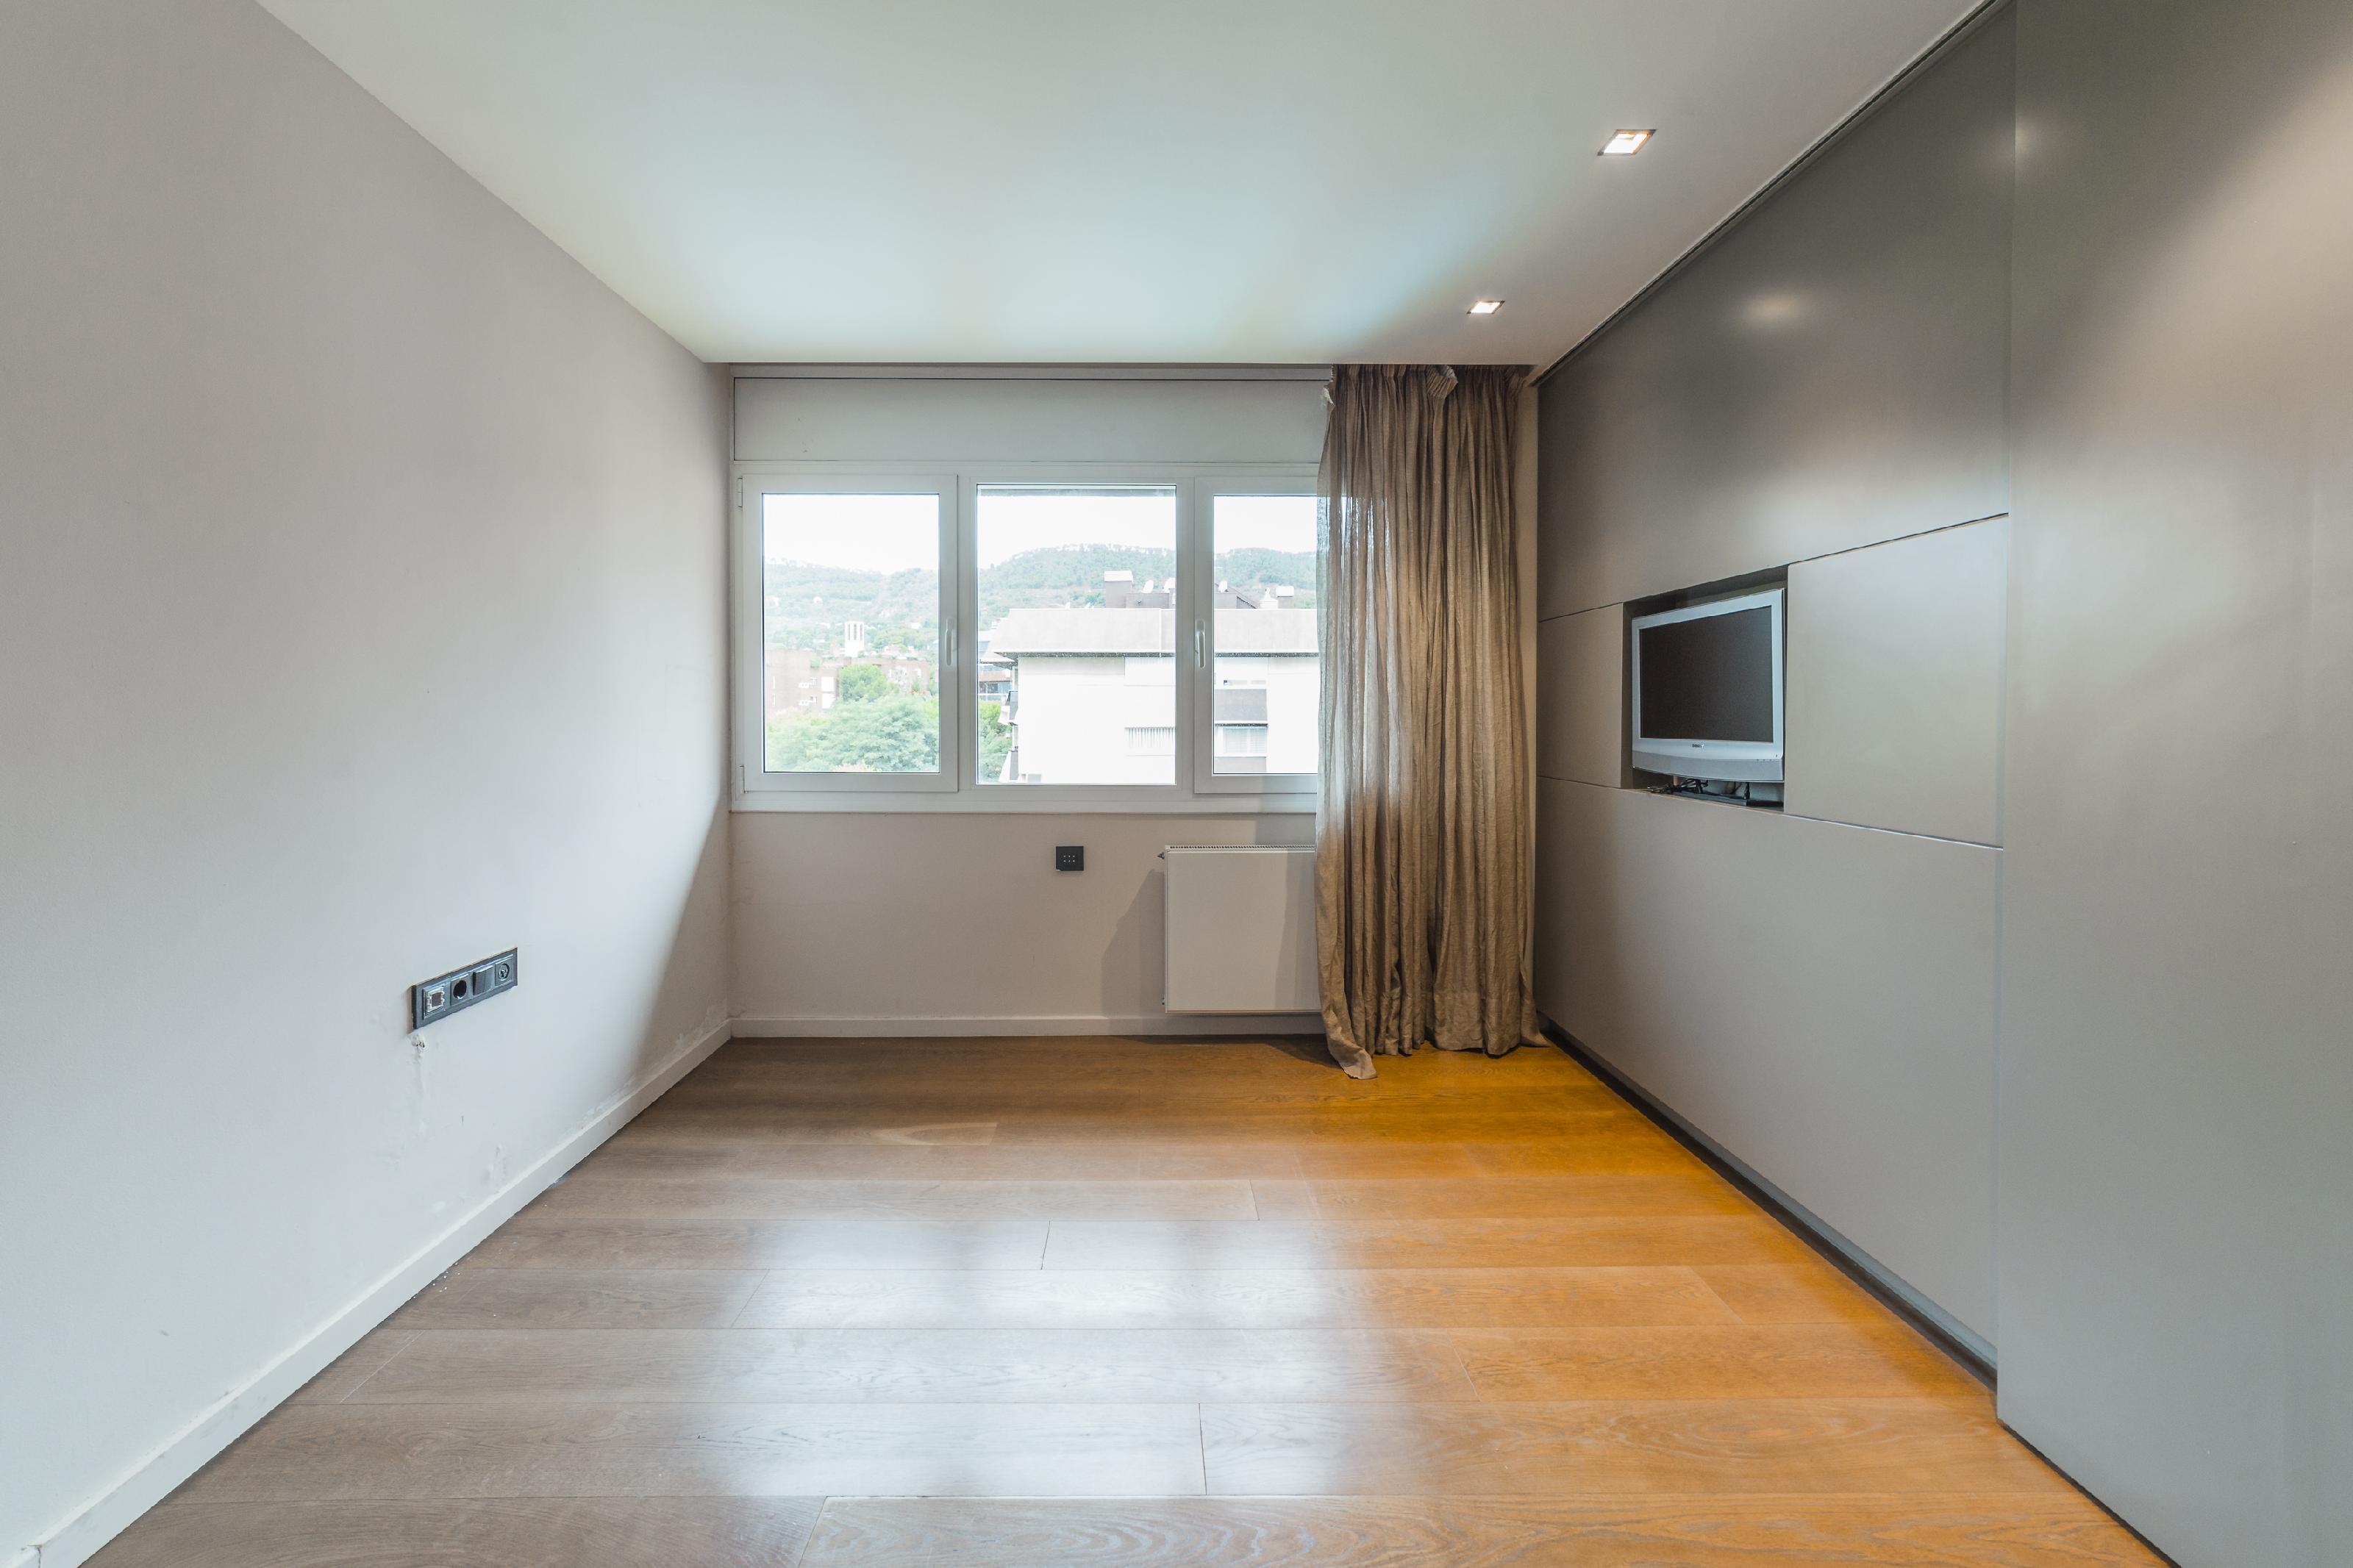 253684 Penthouse for sale in Sarrià-Sant Gervasi, Sarrià 21